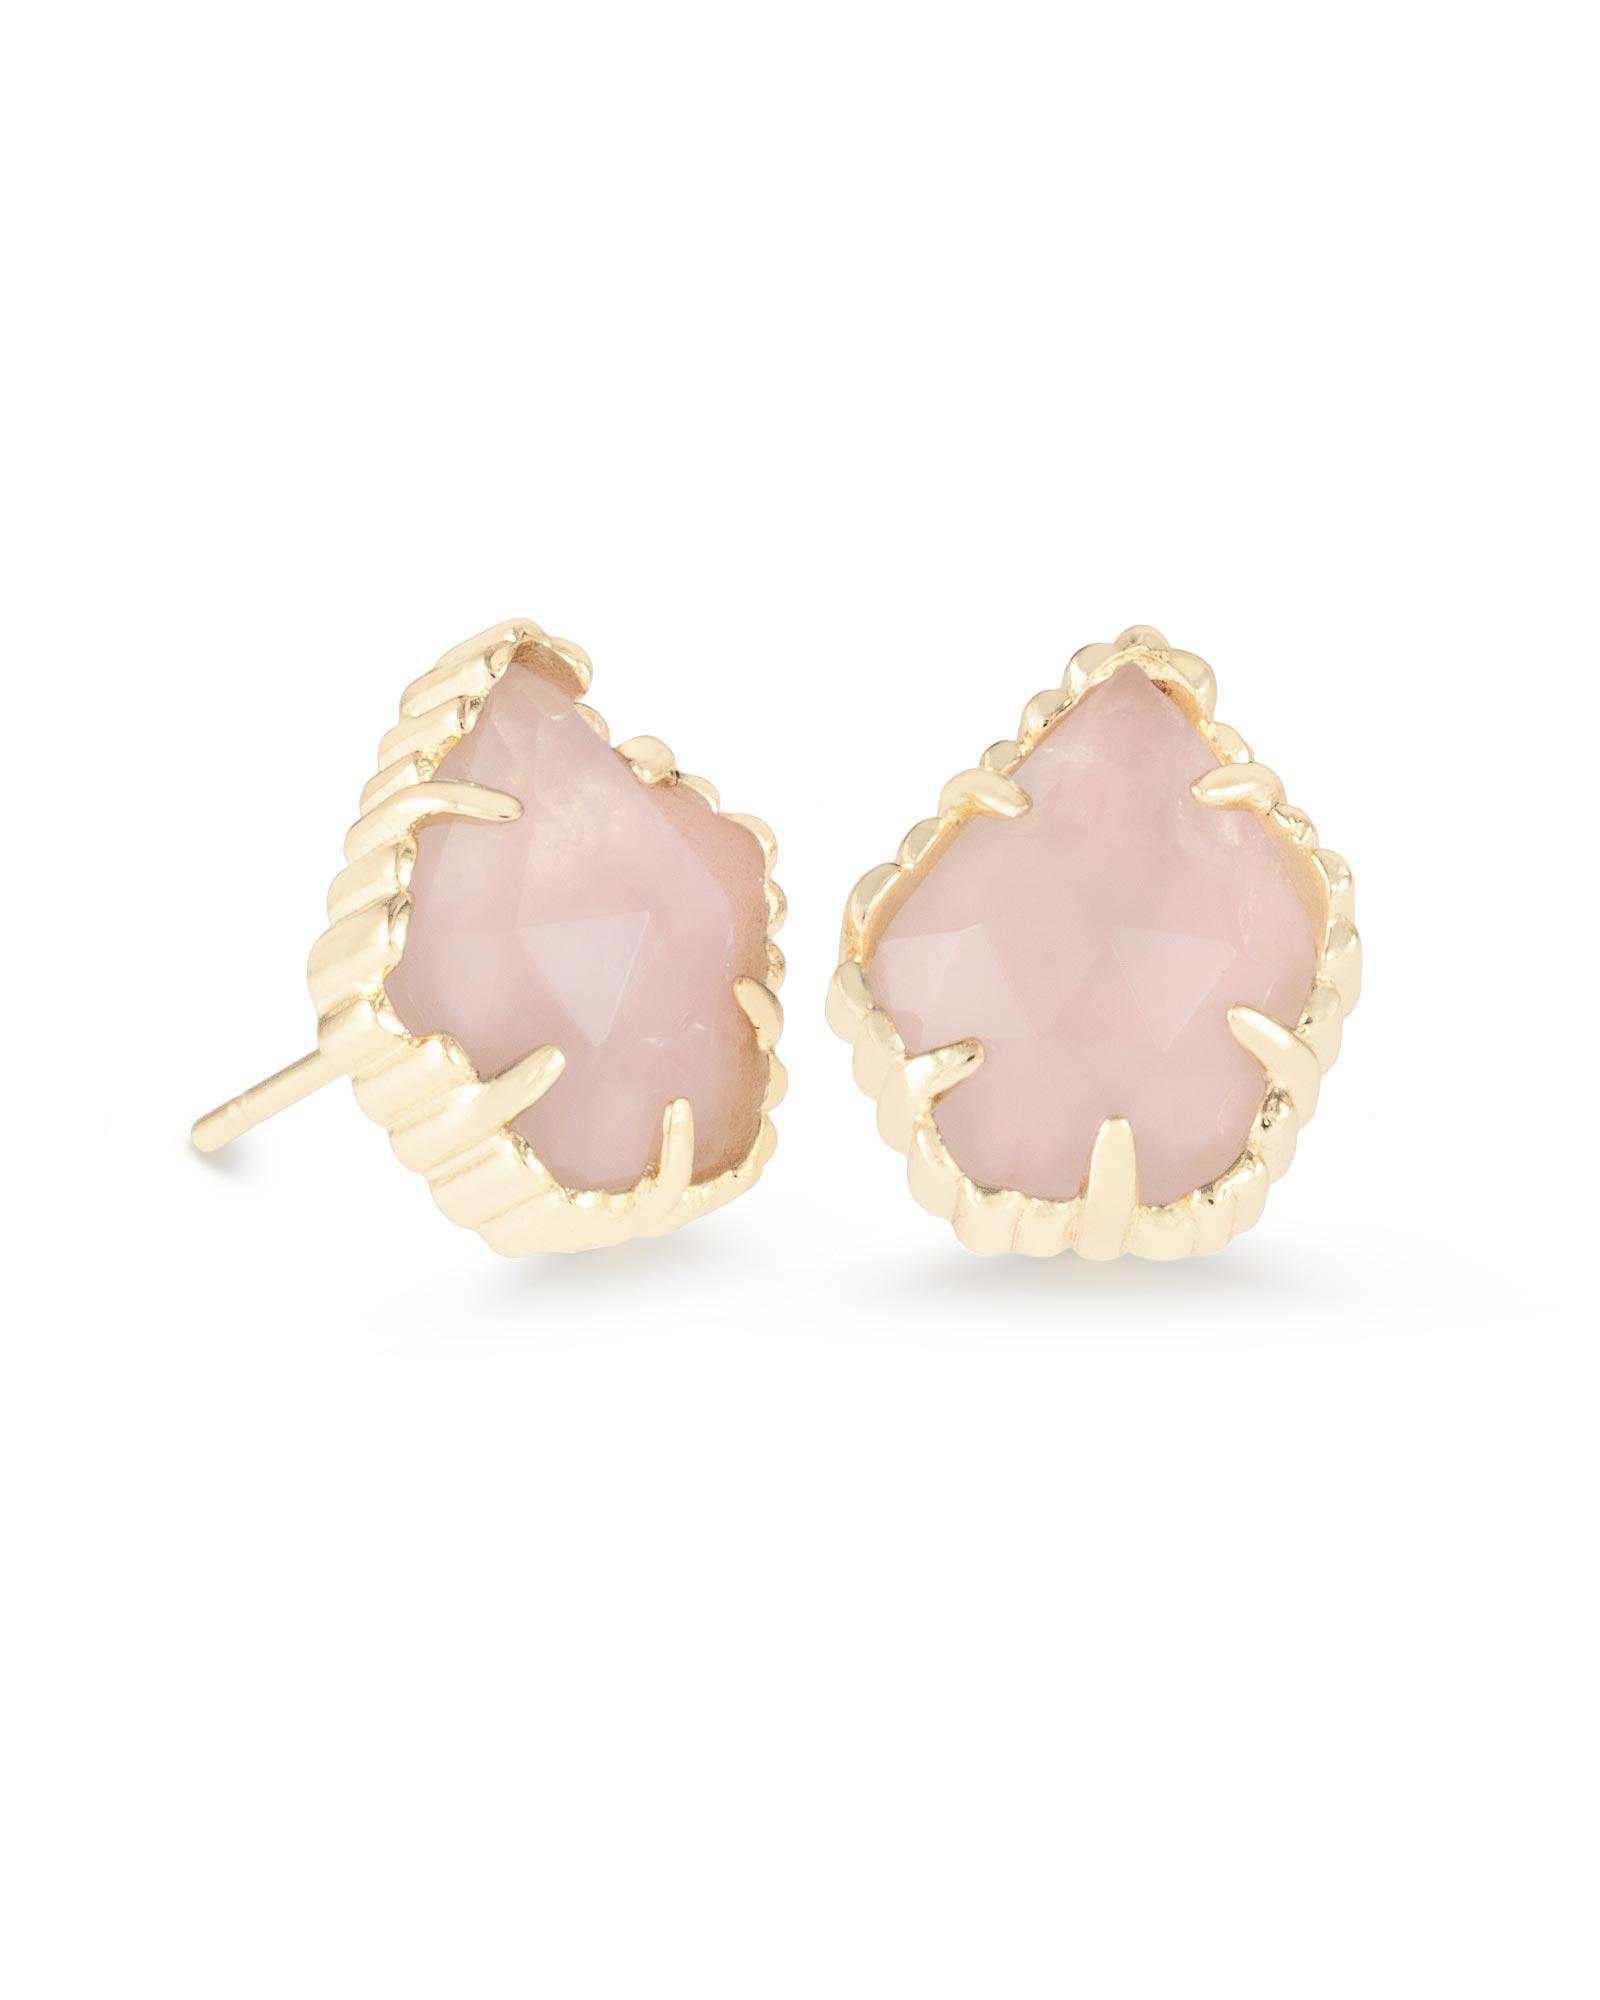 Tessa Stud Earrings In Rose Quartz